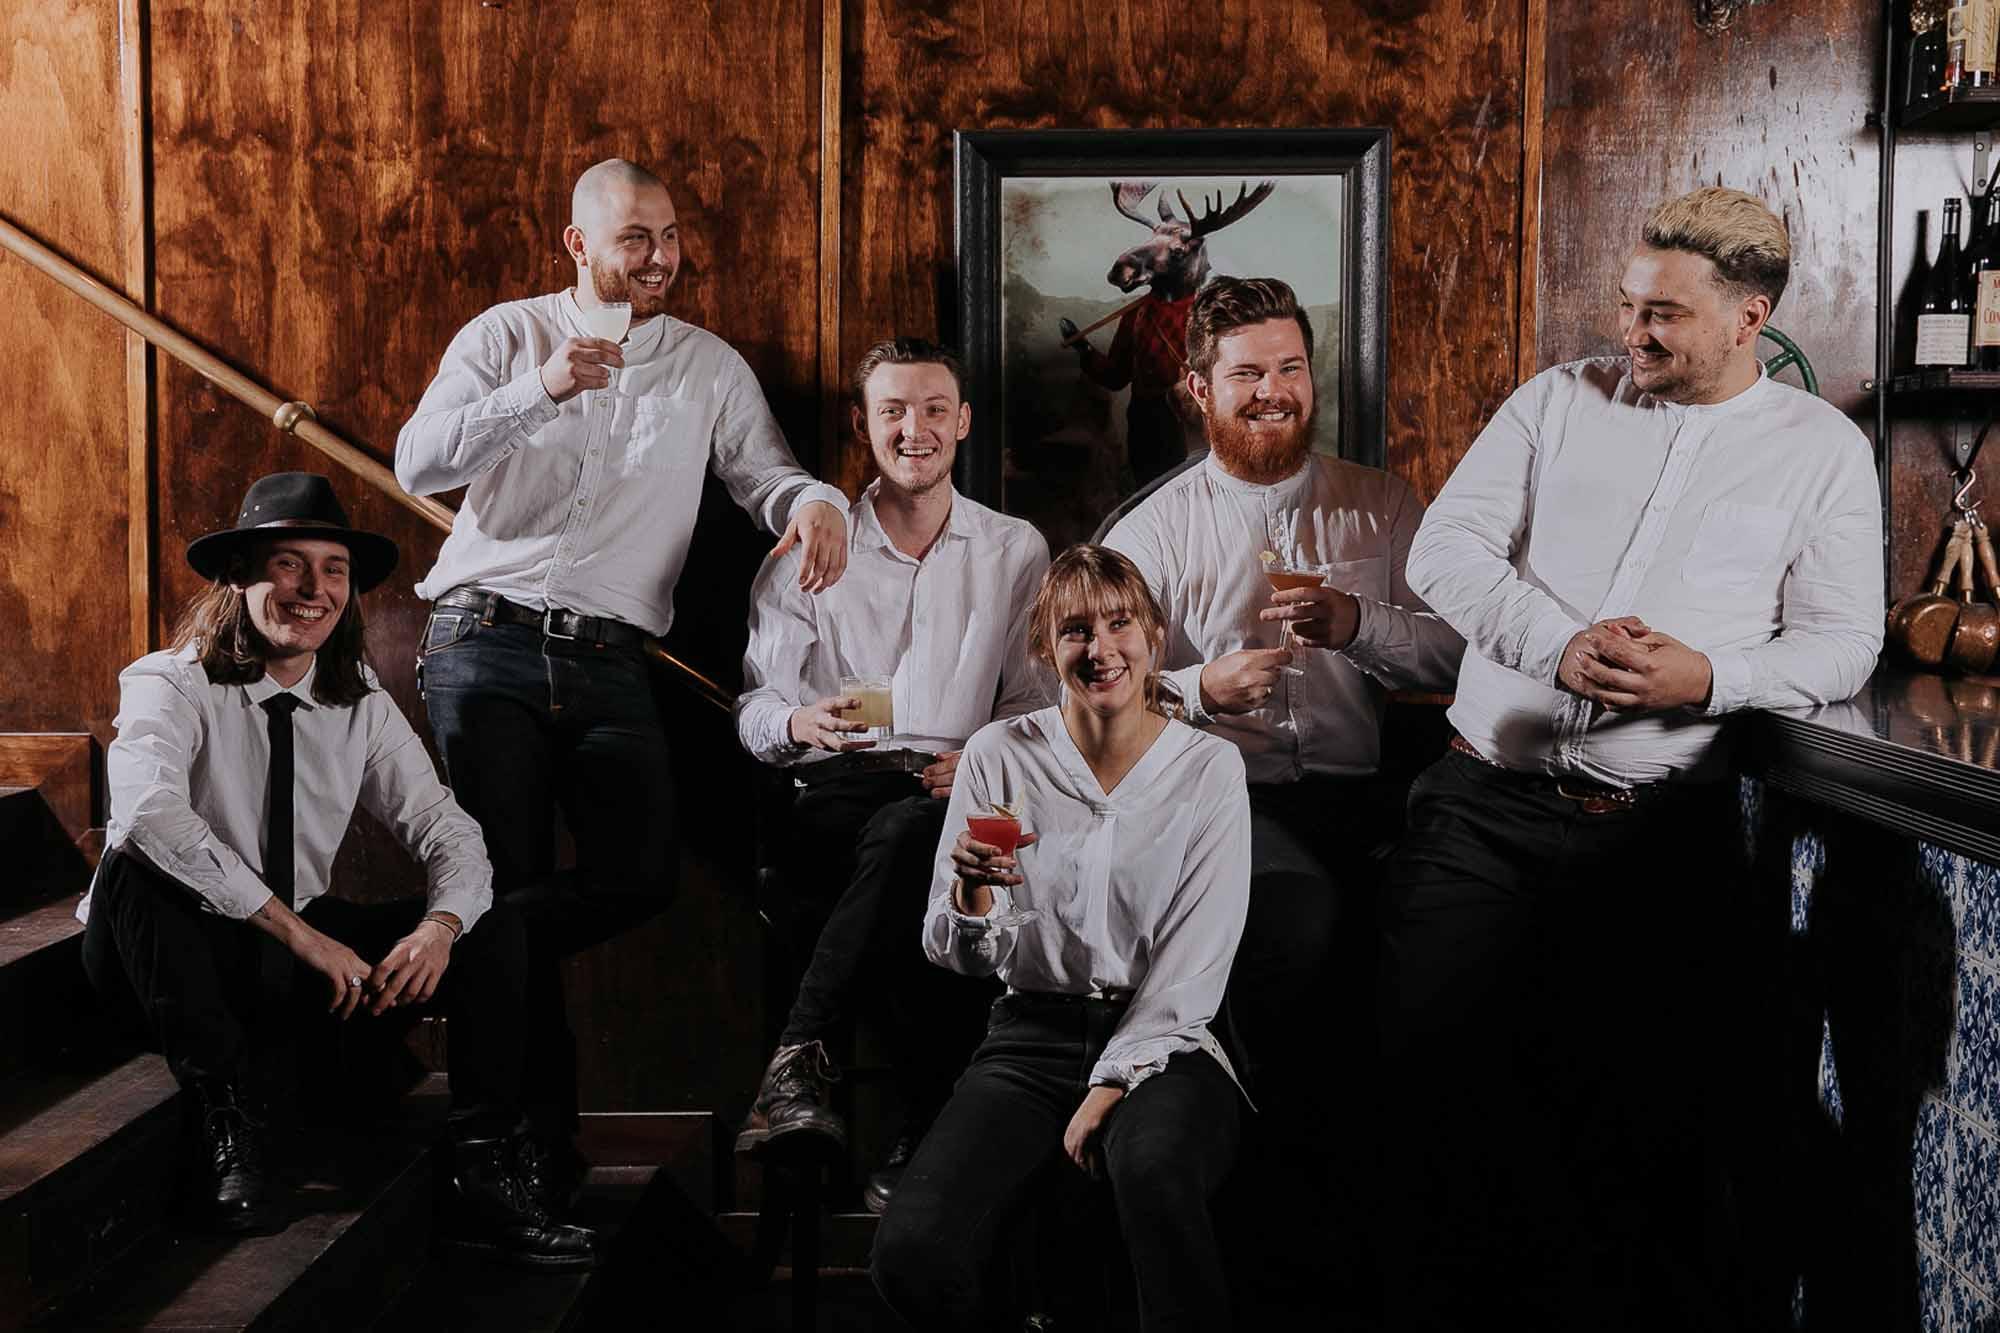 The Saville Row team. Photo: Supplied